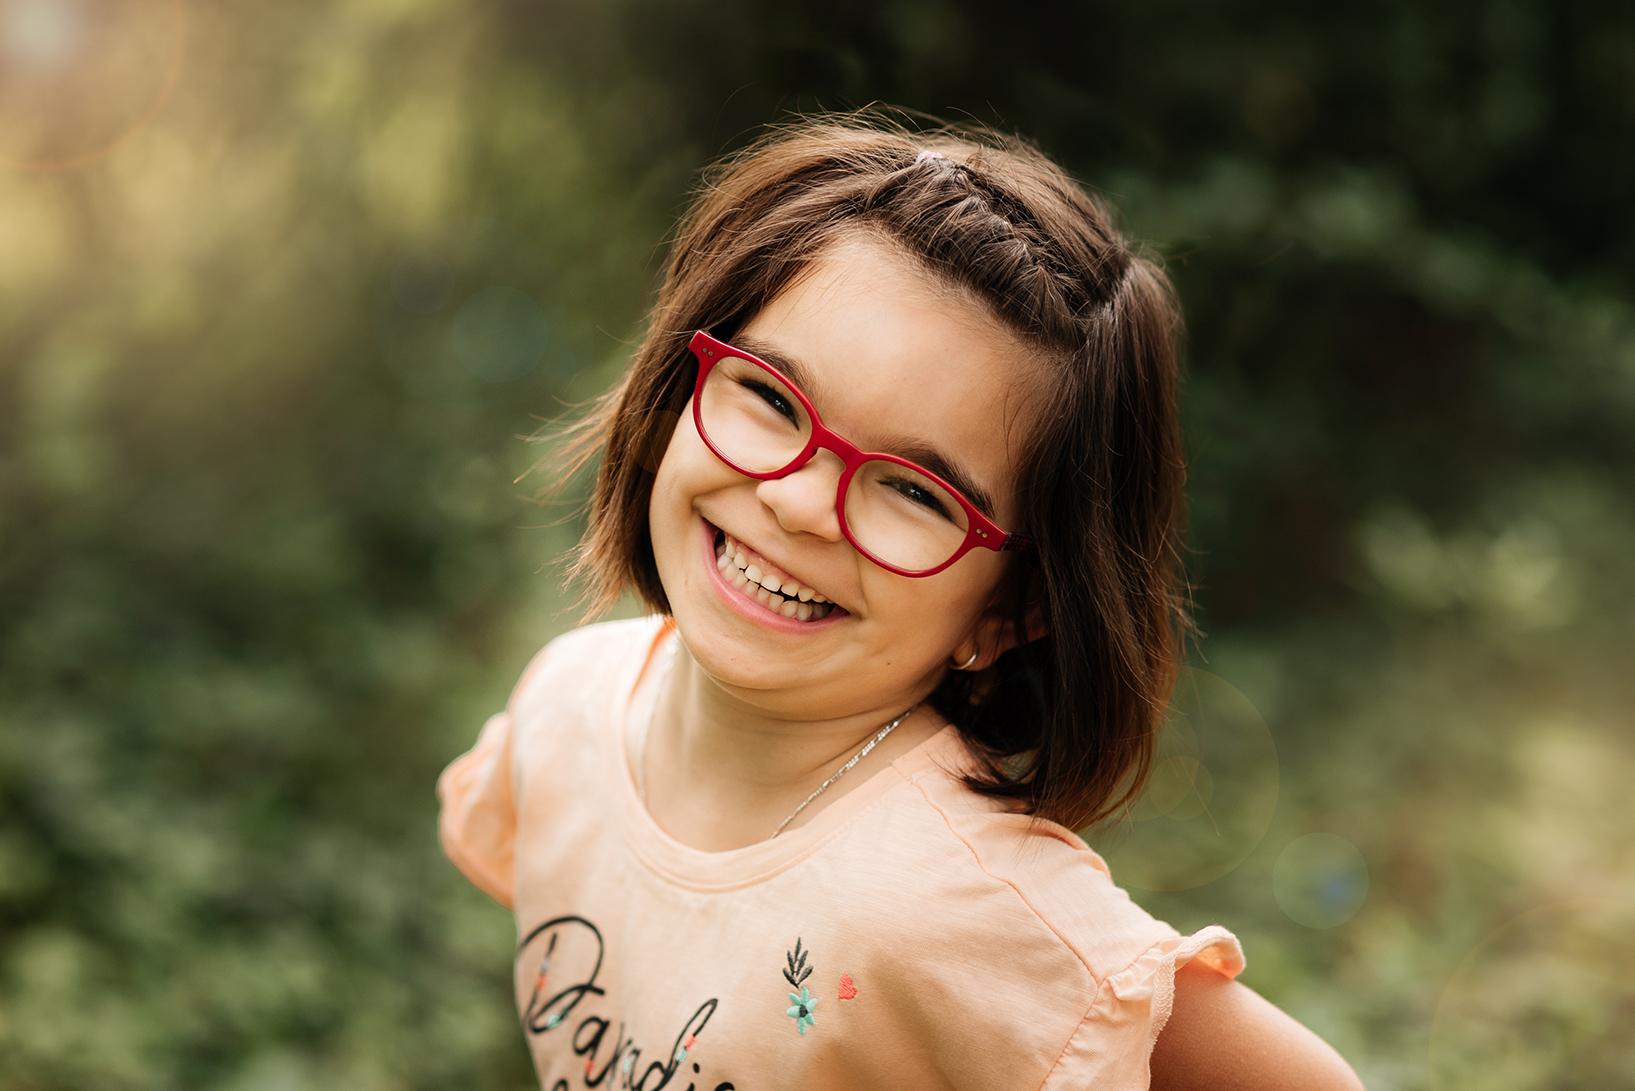 sesion-fotos-bebé-niños-fotografo-reportaje-familia-donosti-gipuzkoa-san-sebastian-zumaia